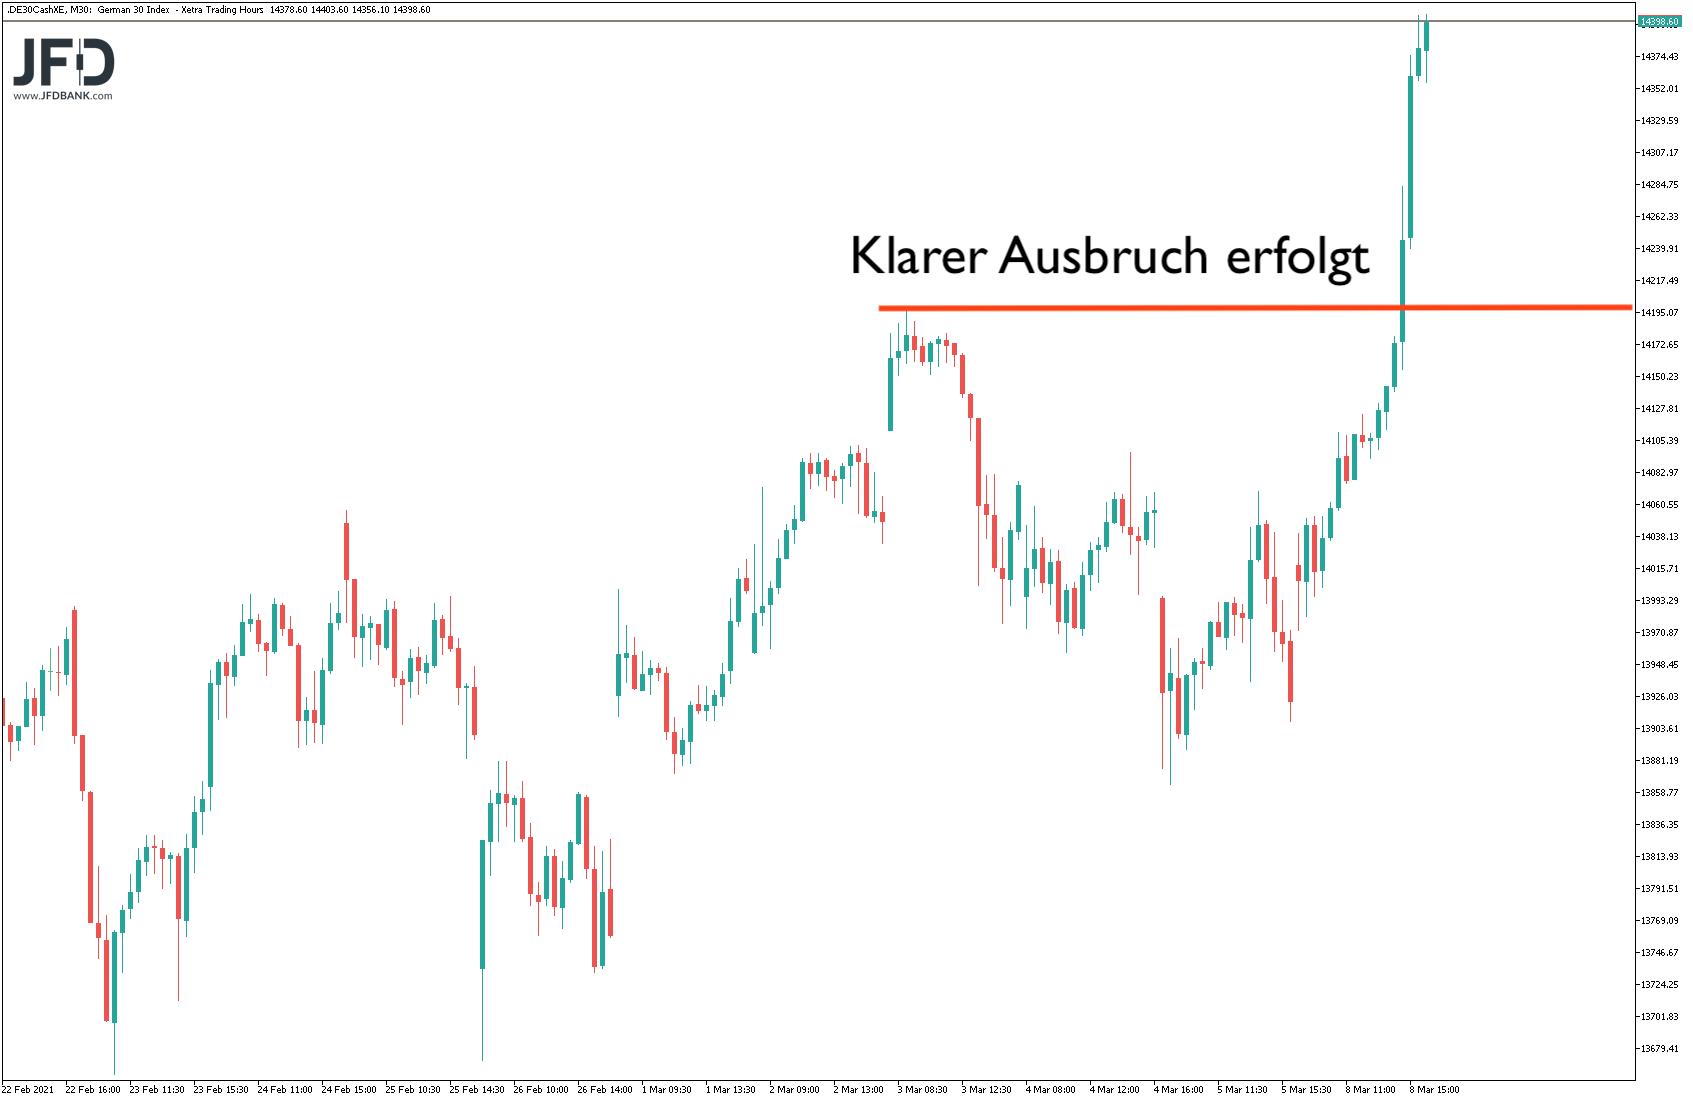 DAX-Rekordhoch-erzielt-halten-wir-das-Niveau-Kommentar-JFD-Bank-GodmodeTrader.de-3